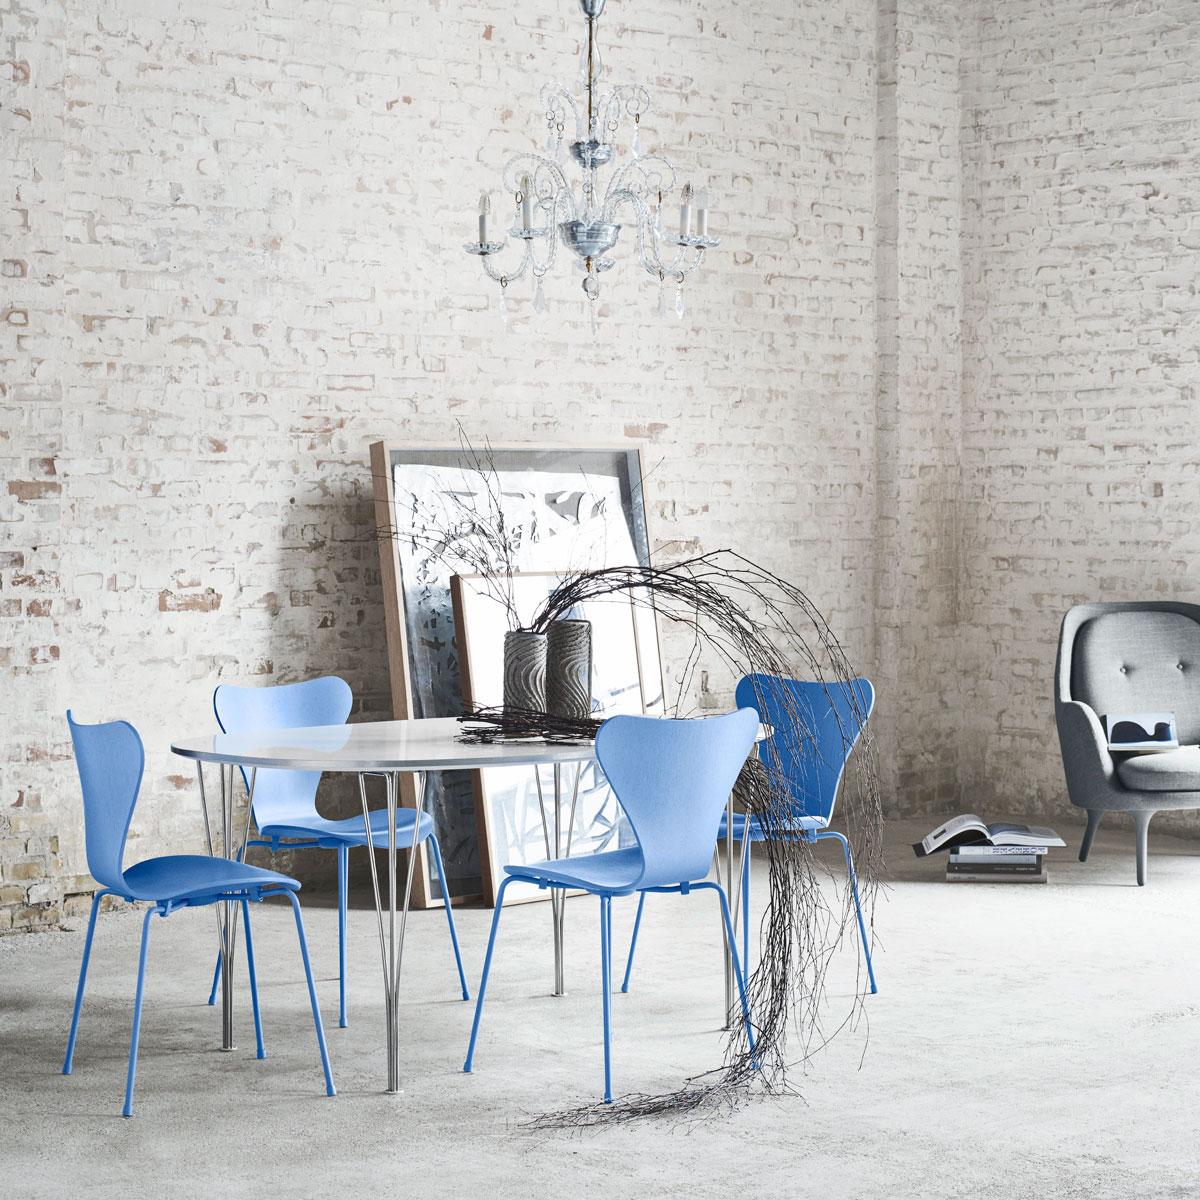 hansen series 7 3107 butterfly chair monochrome door arne jacobsen. Black Bedroom Furniture Sets. Home Design Ideas